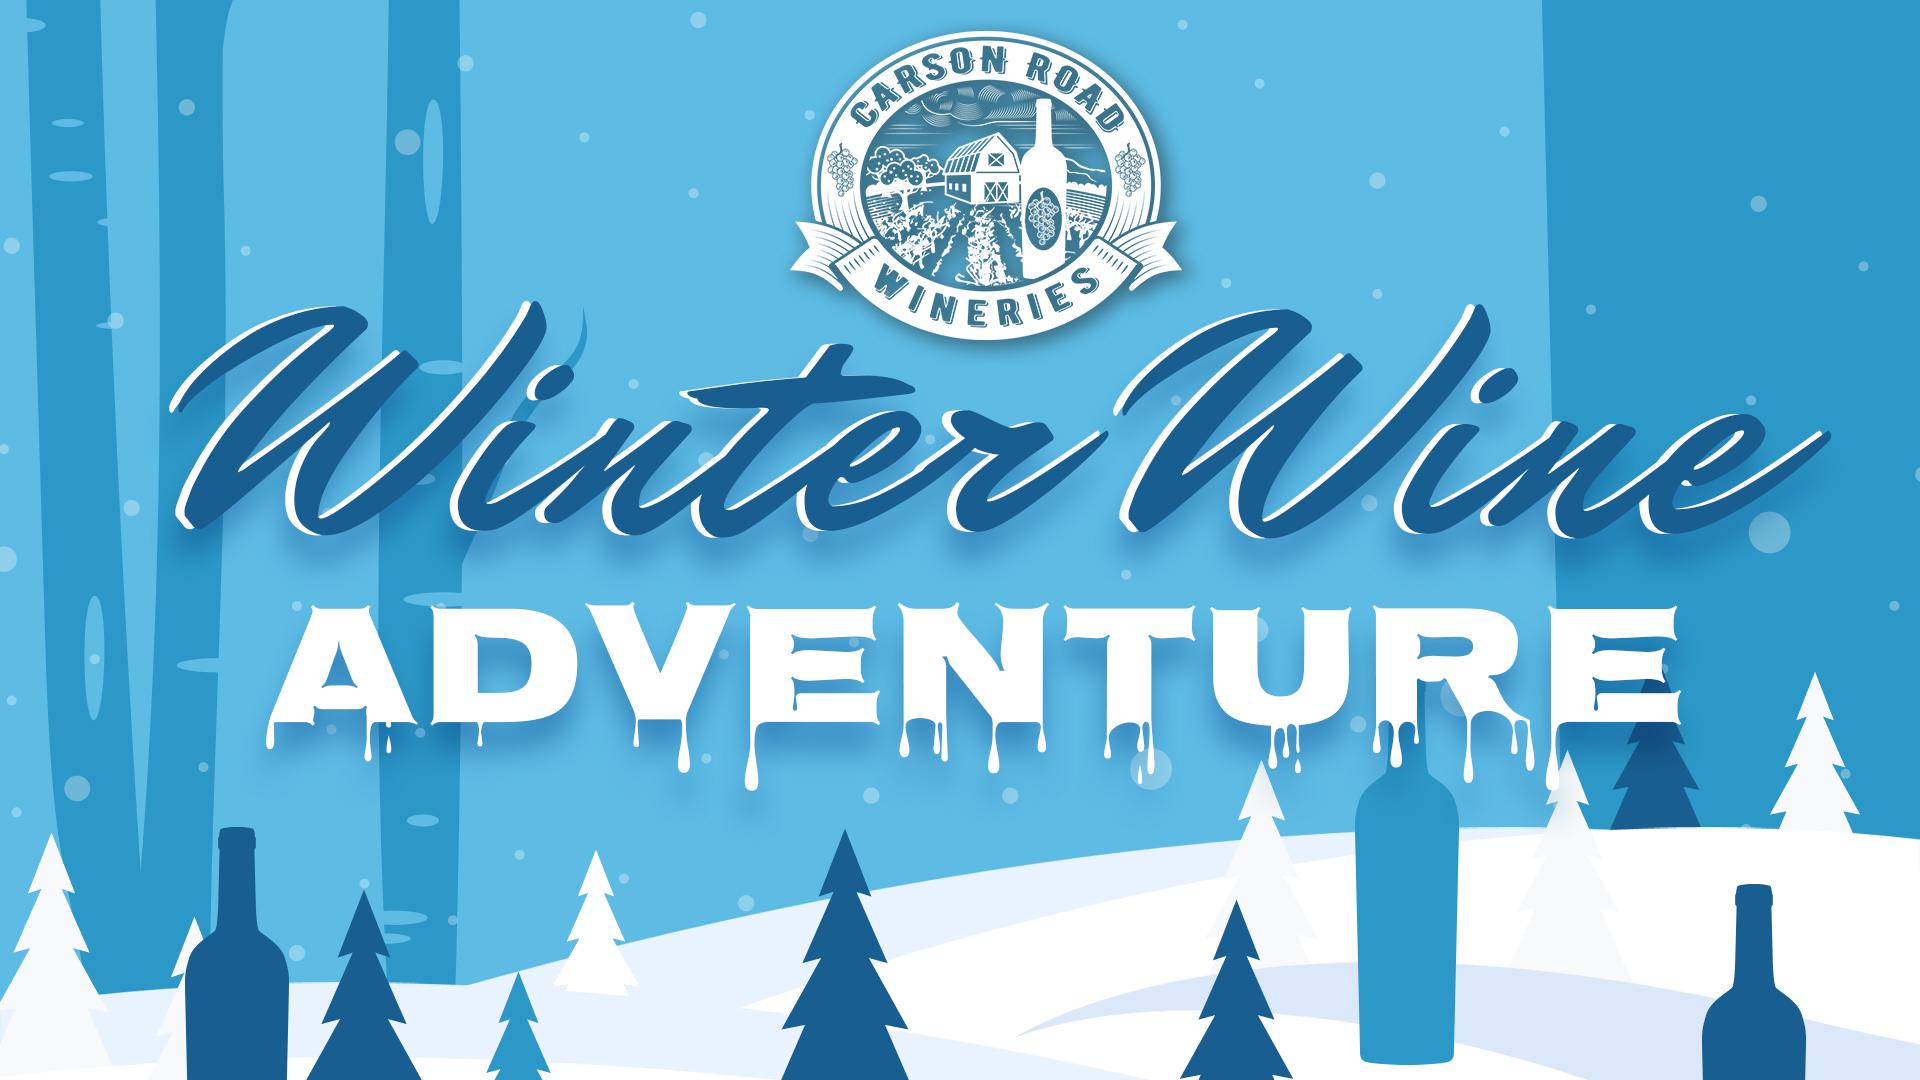 Winter-Wine-adventure-banner